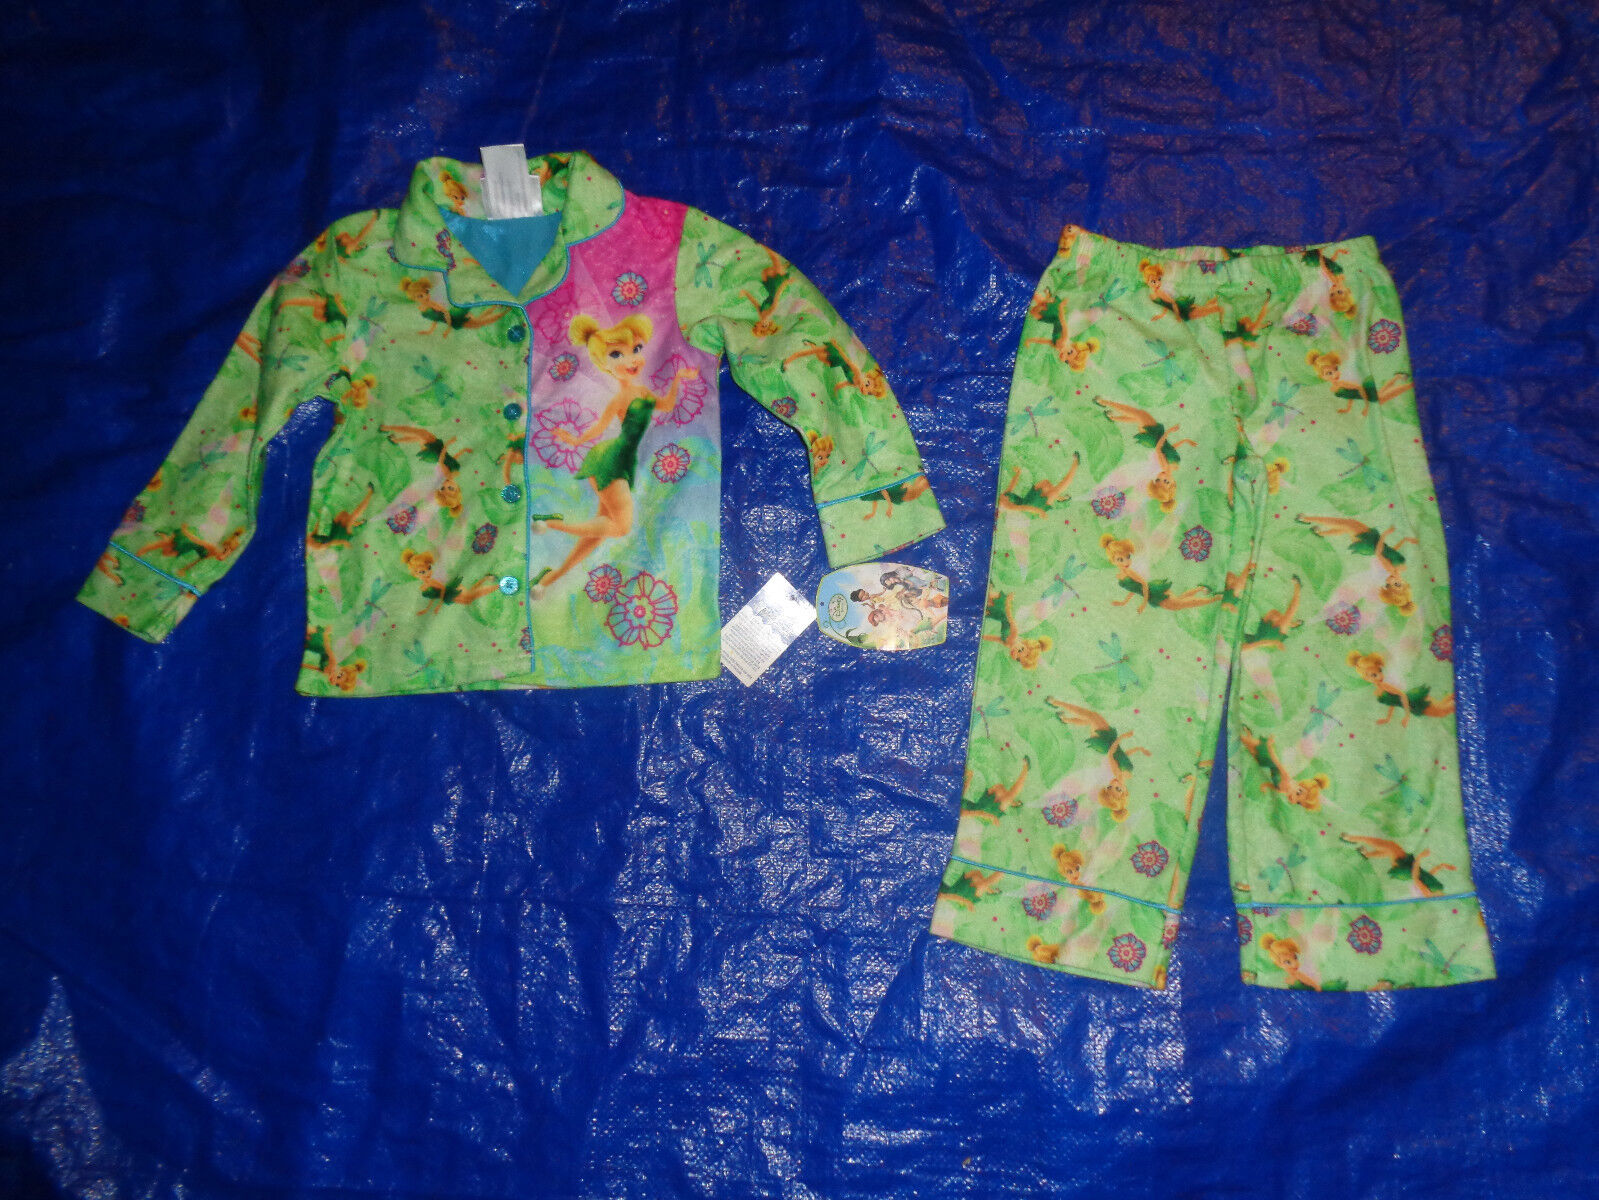 Tinkerbell Tinker Bell Blue Short Pajama PJ 2 Piece Set Girls Size 2T NWT